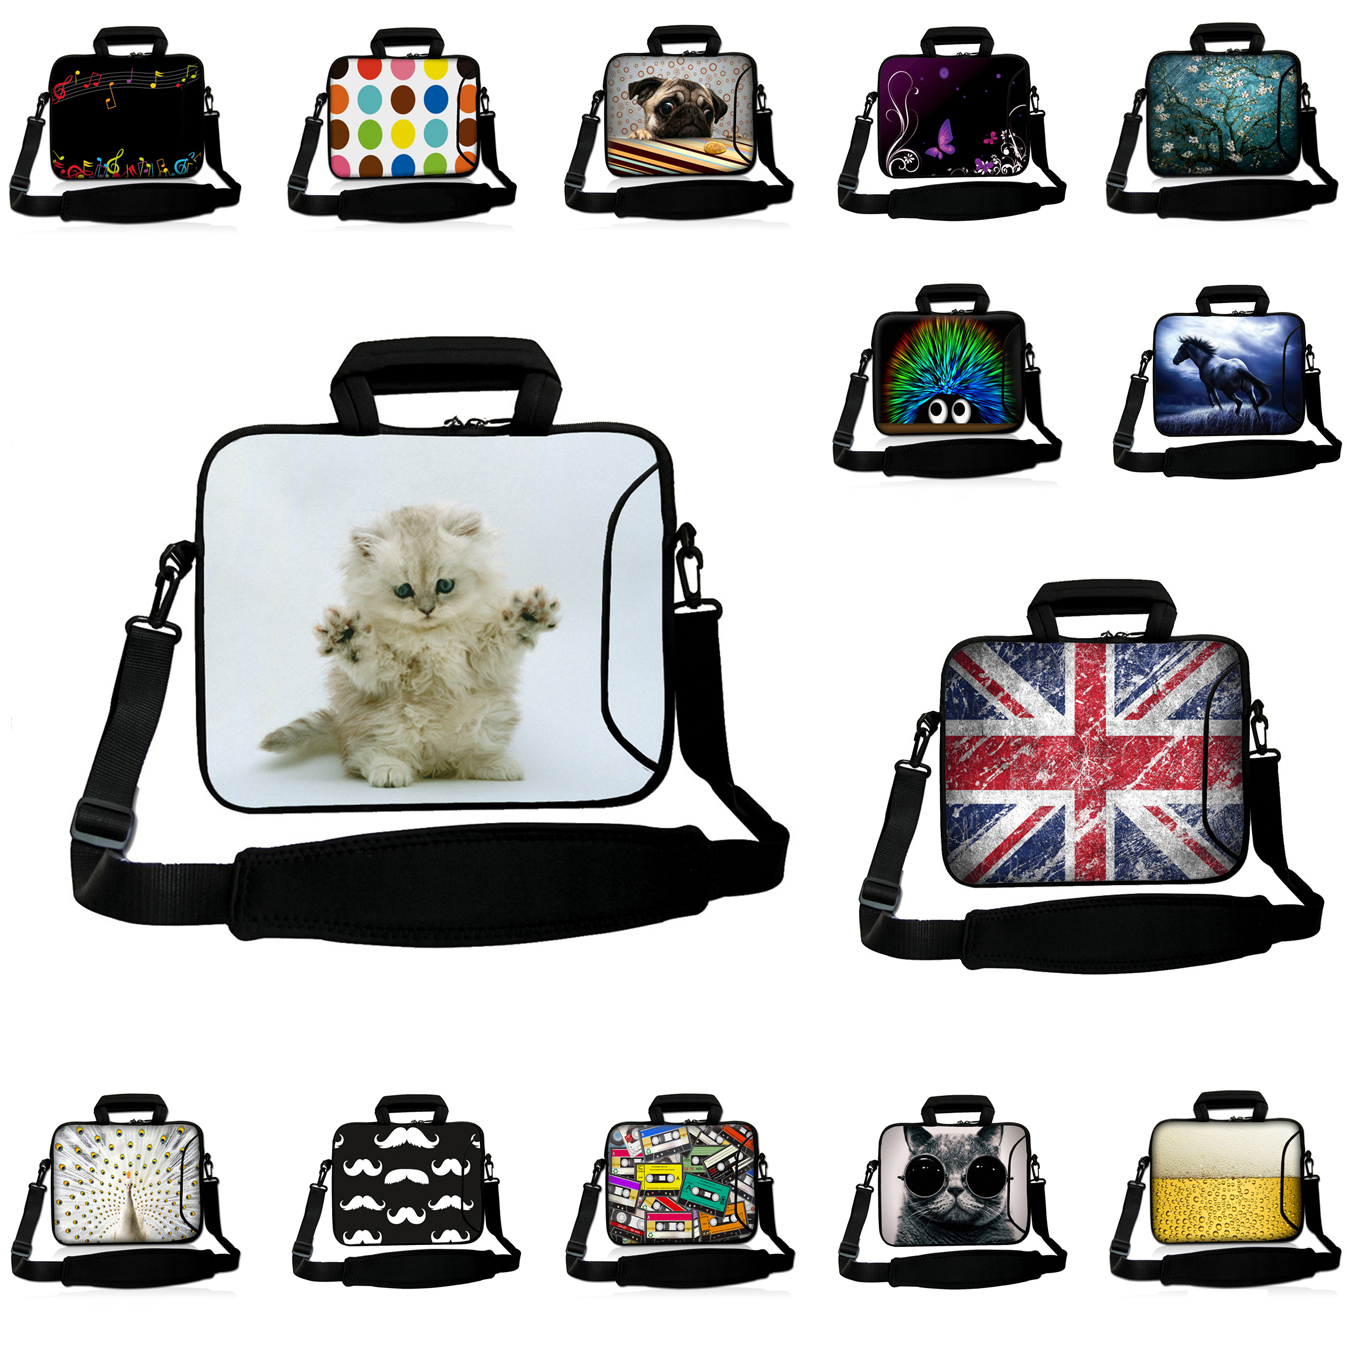 Viviration 15 Inch Notebook Bag 15.6 13.3 14 12.3 12 10 17 13 11.6 12.9 10.1 Inch Neoprene Briefcase Handbag Laptop 17.3 Case